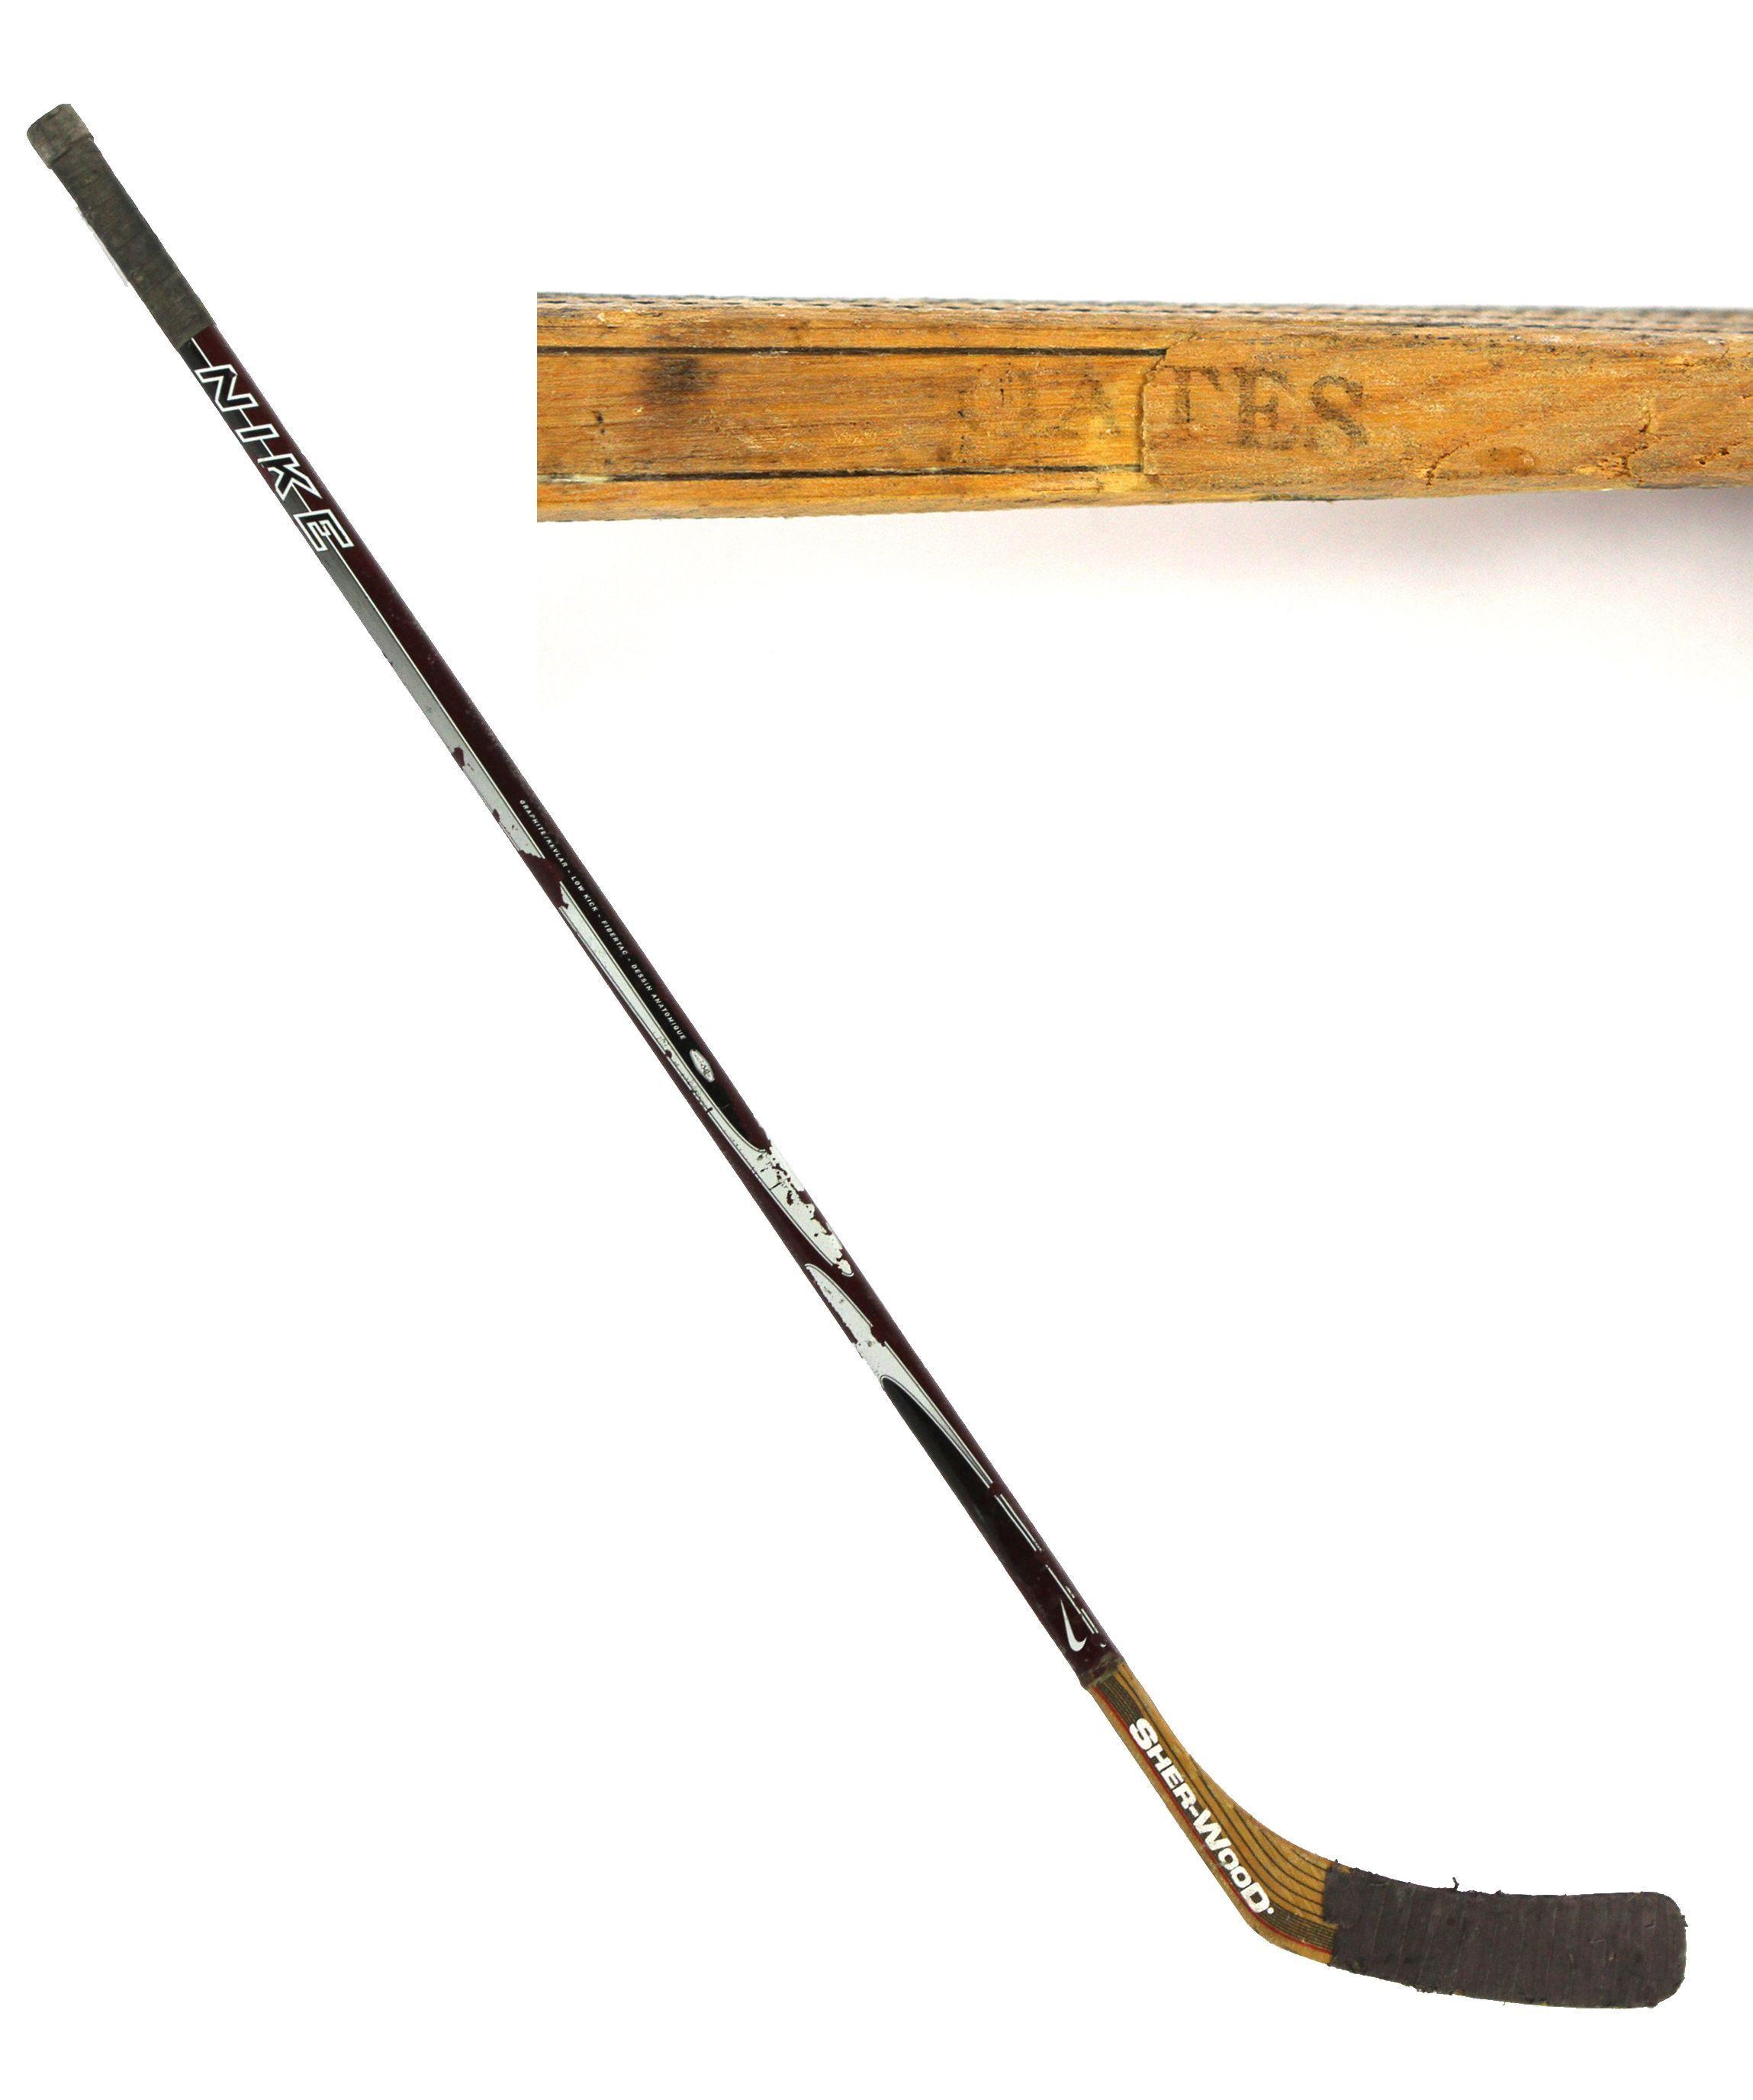 Top 22 Unglaublich Nike Hockey Sticks Gemeinsam Haben Hockeys Info Hockey Hockeyschlager Nike